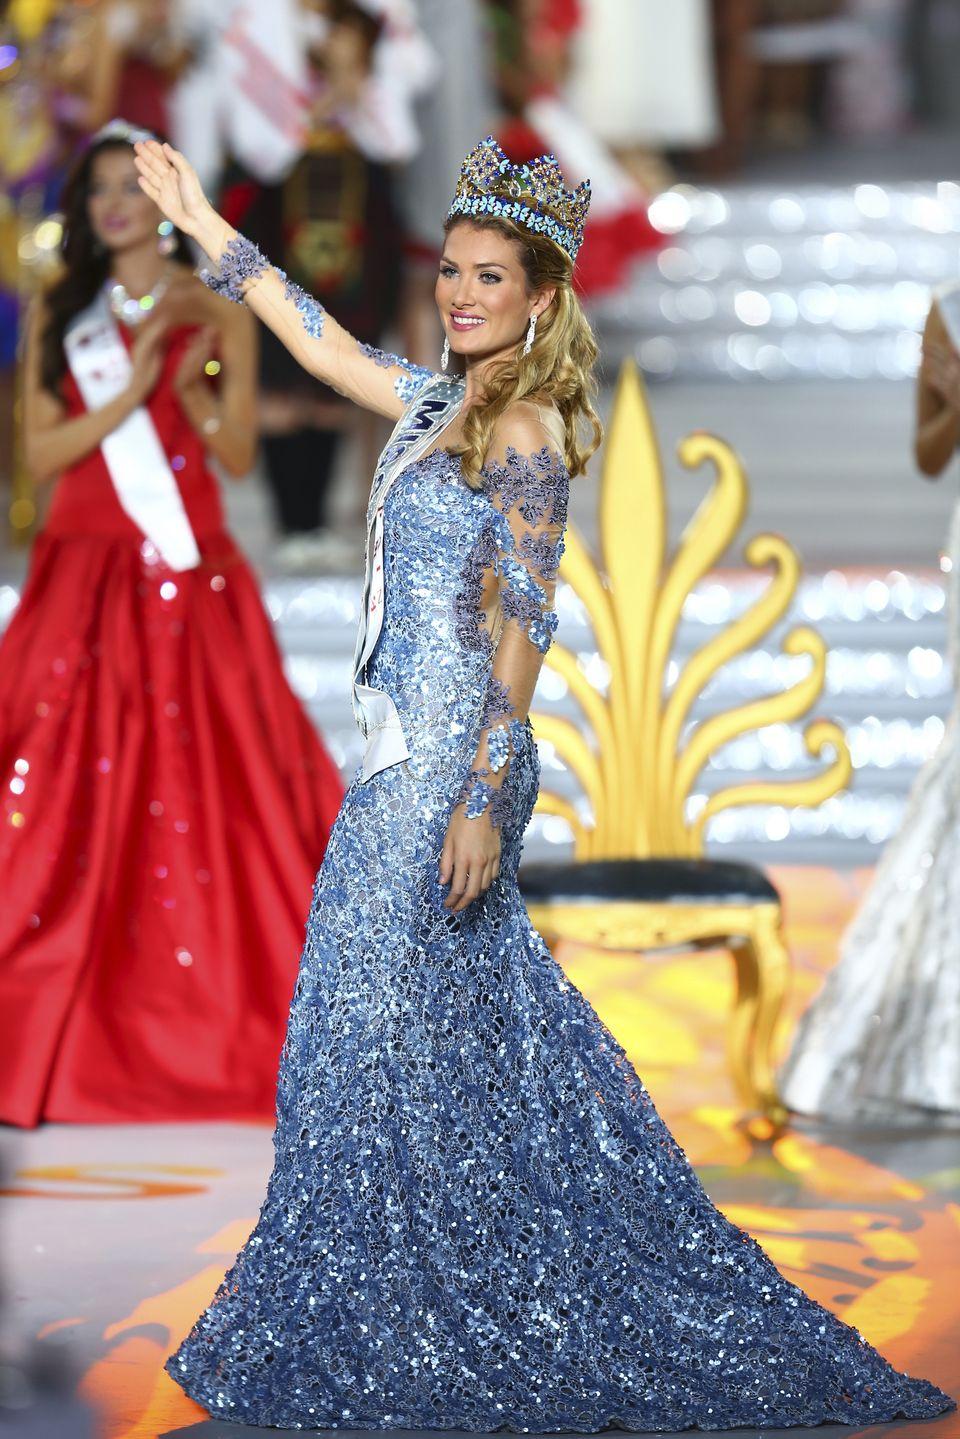 mireia lalaguna, miss world 2015. Cb32a410